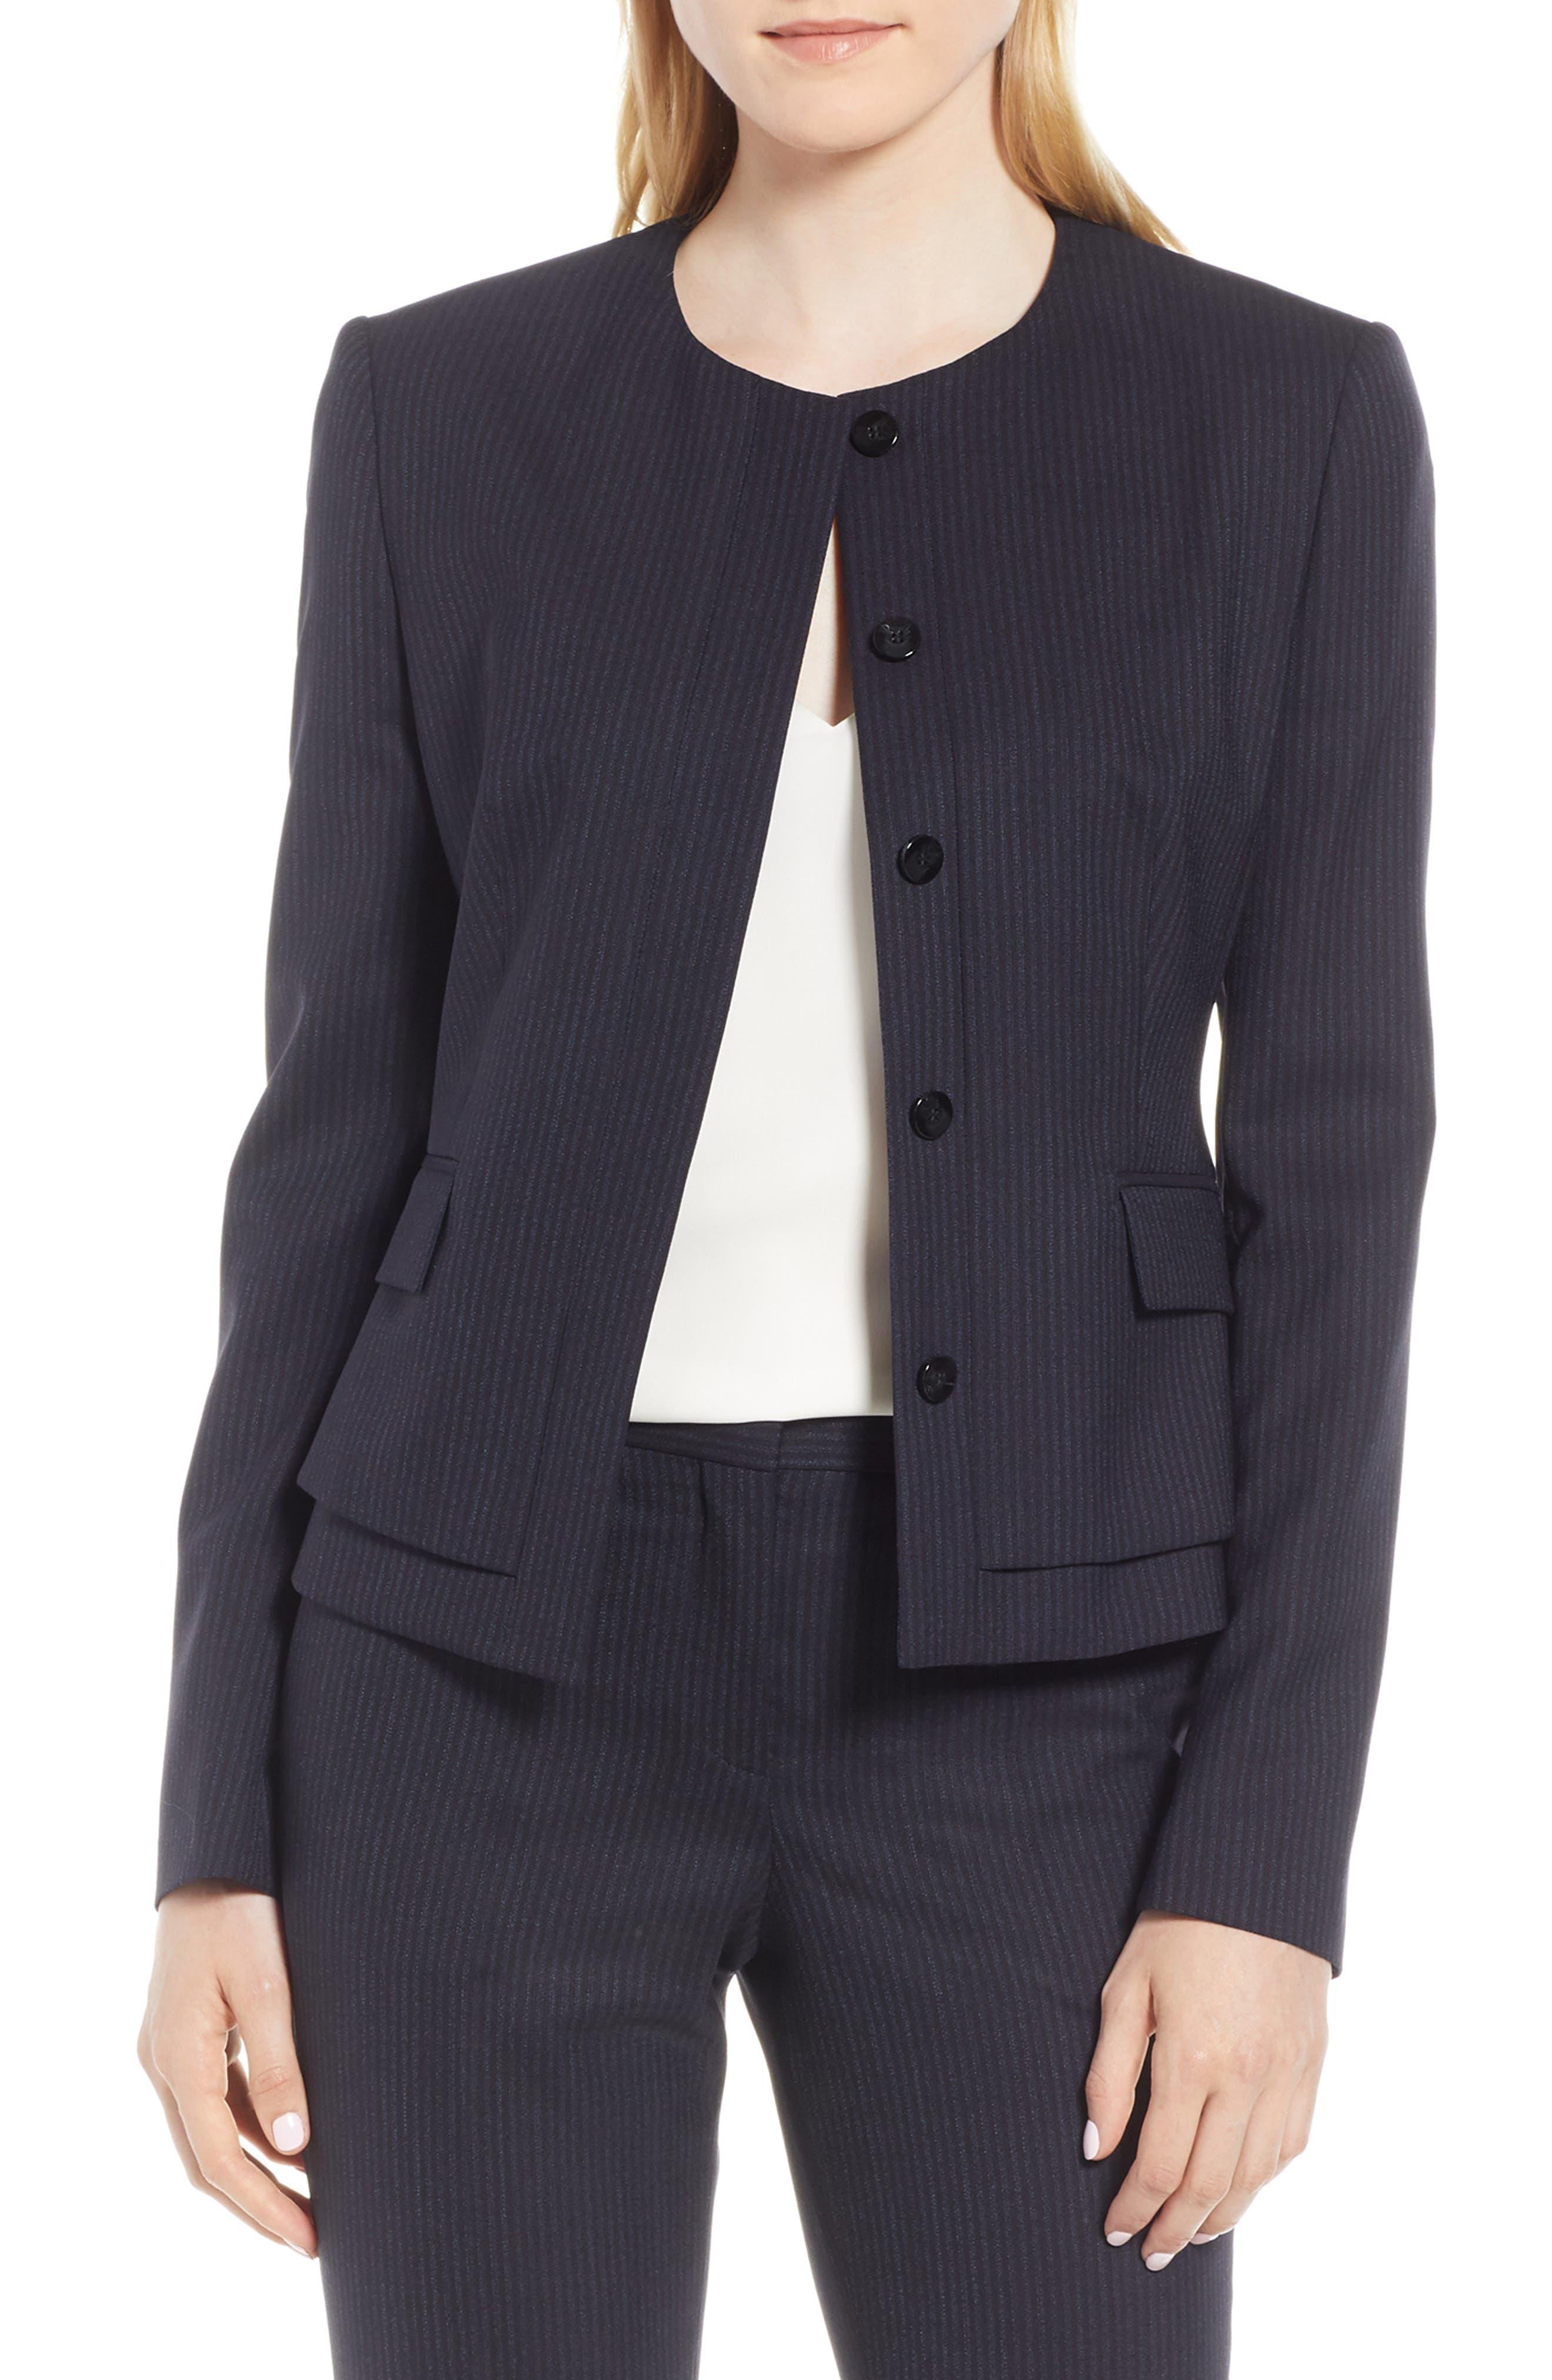 BOSS Jasyma Tonal Stripe Stretch Wool Suit Jacket